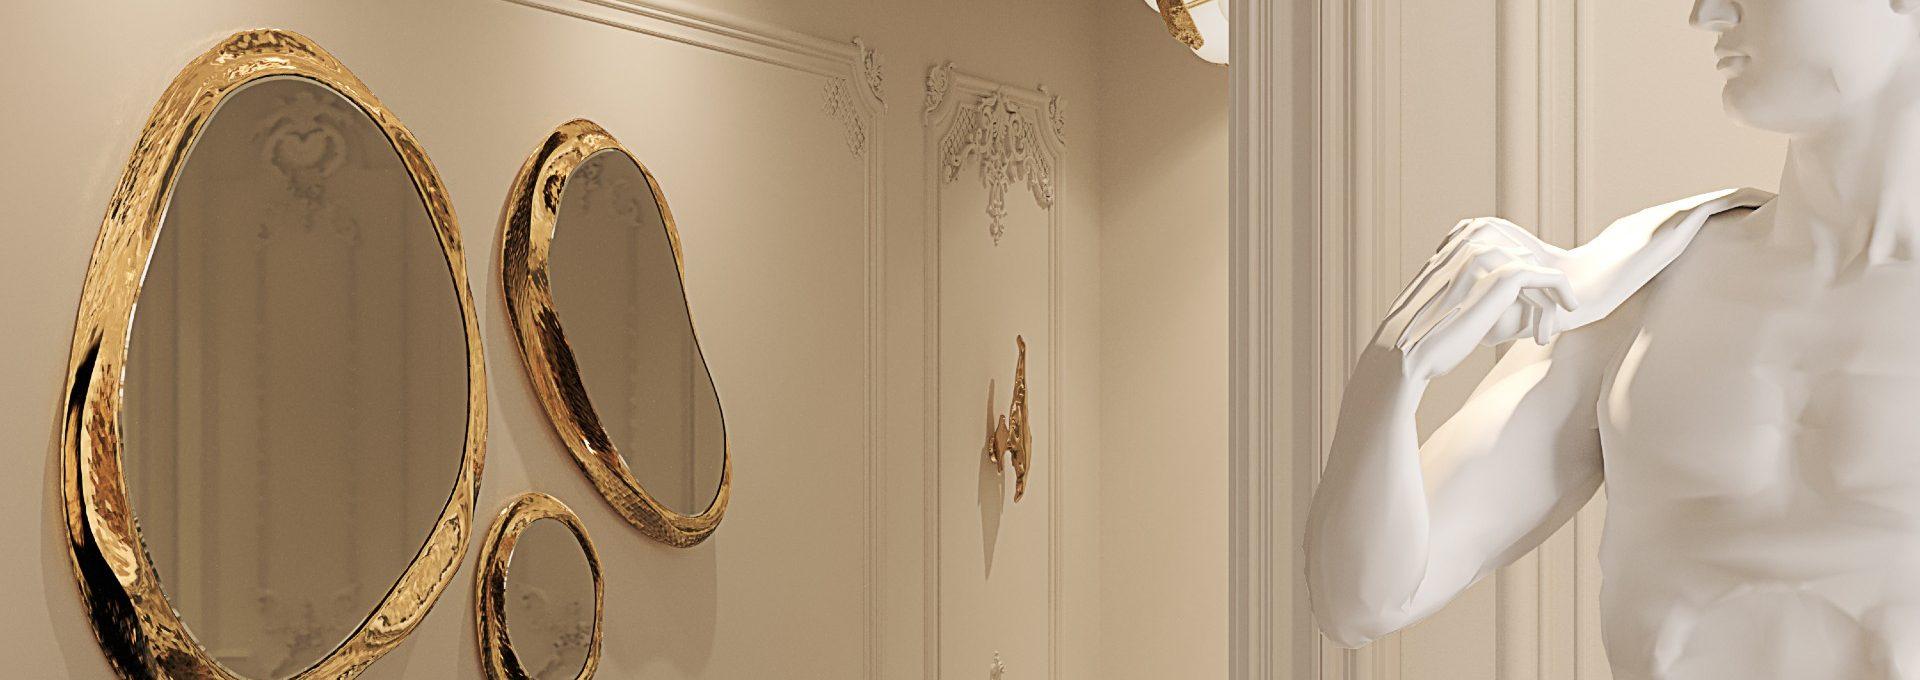 Gallery-Worthy Modern Mirrors (11)__